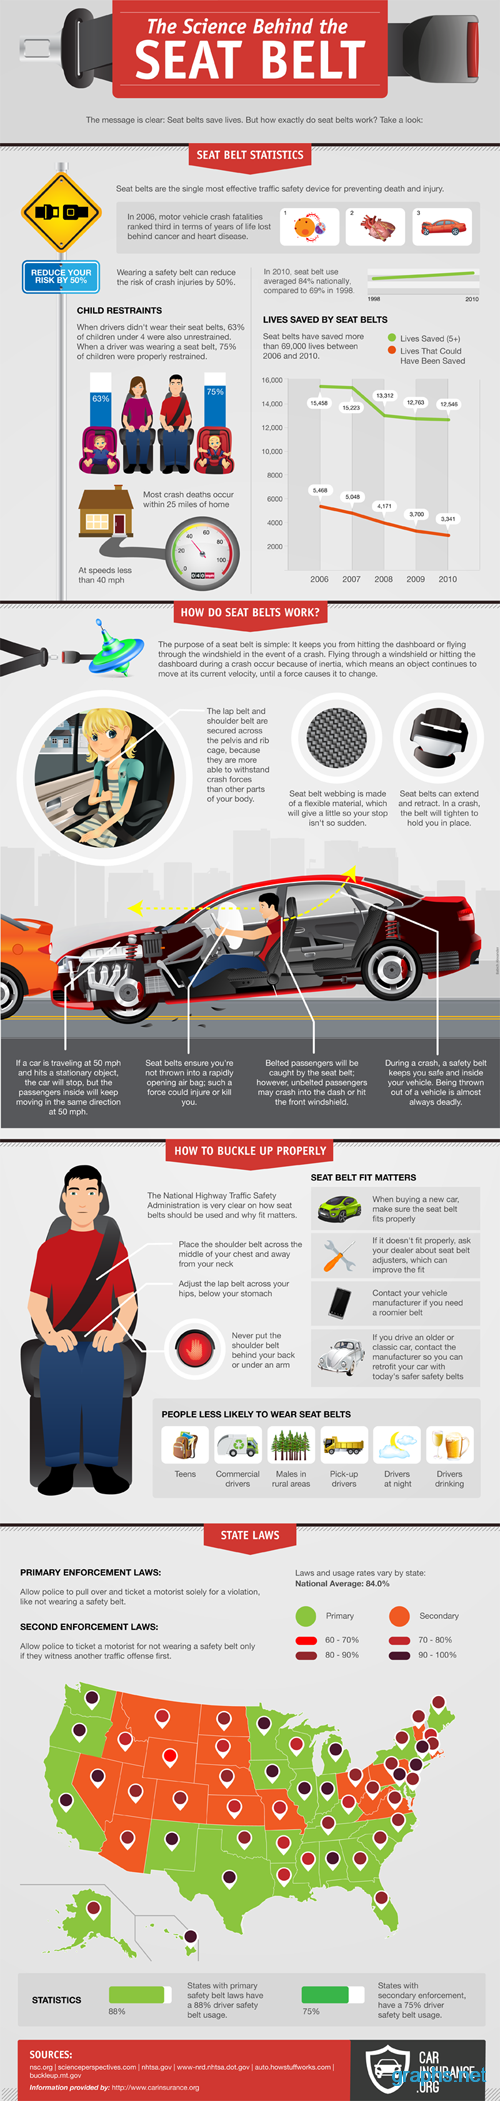 Seat Belt Facts and Statistics